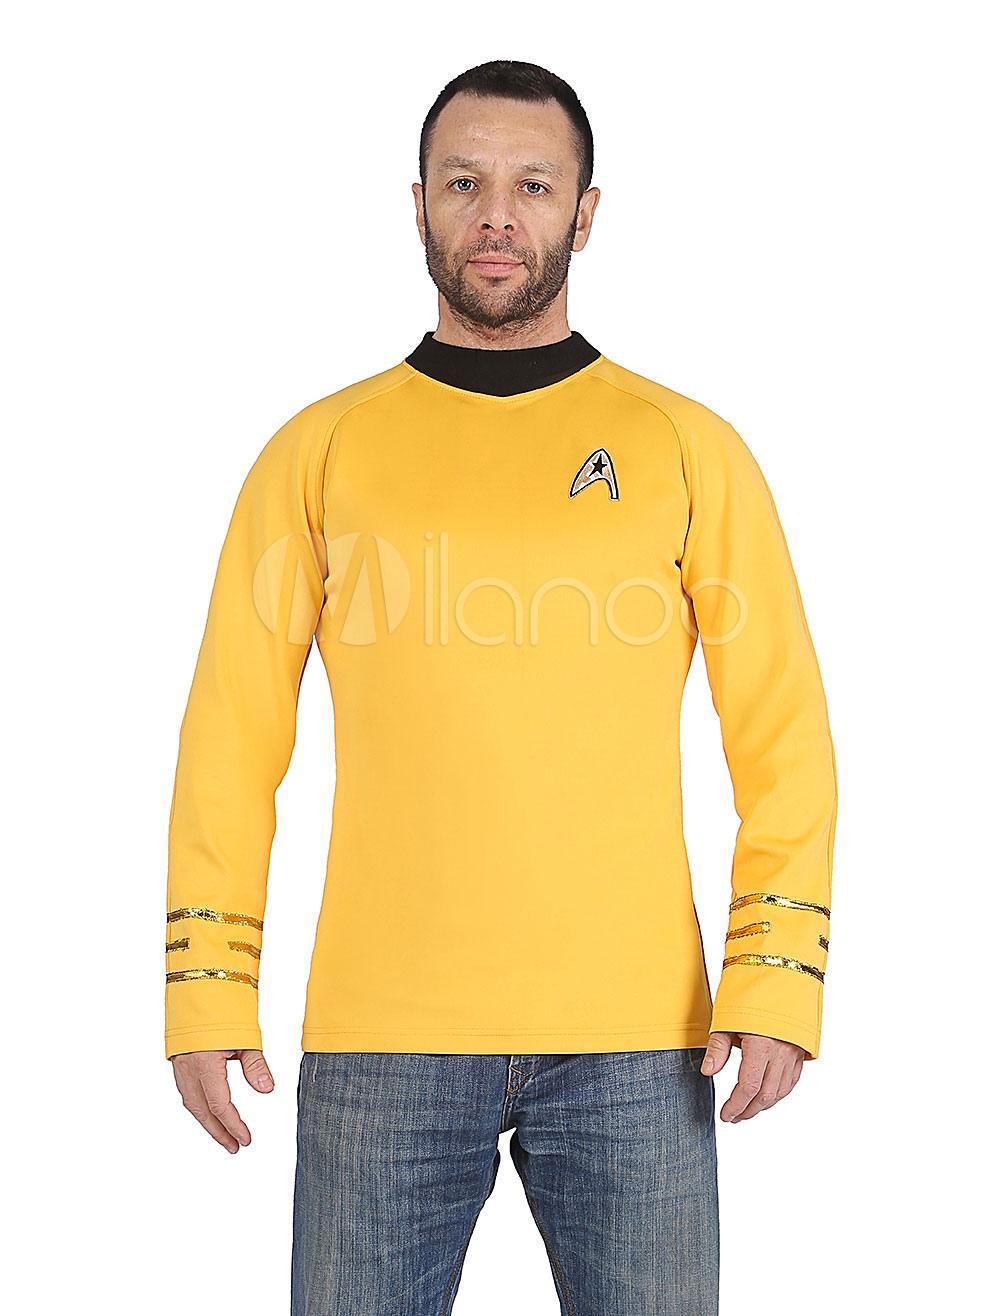 Buy Star Trek James T Kirk 2018 Film Cosplay Costume Long Sleeve T Shirt Halloween for $44.99 in Milanoo store